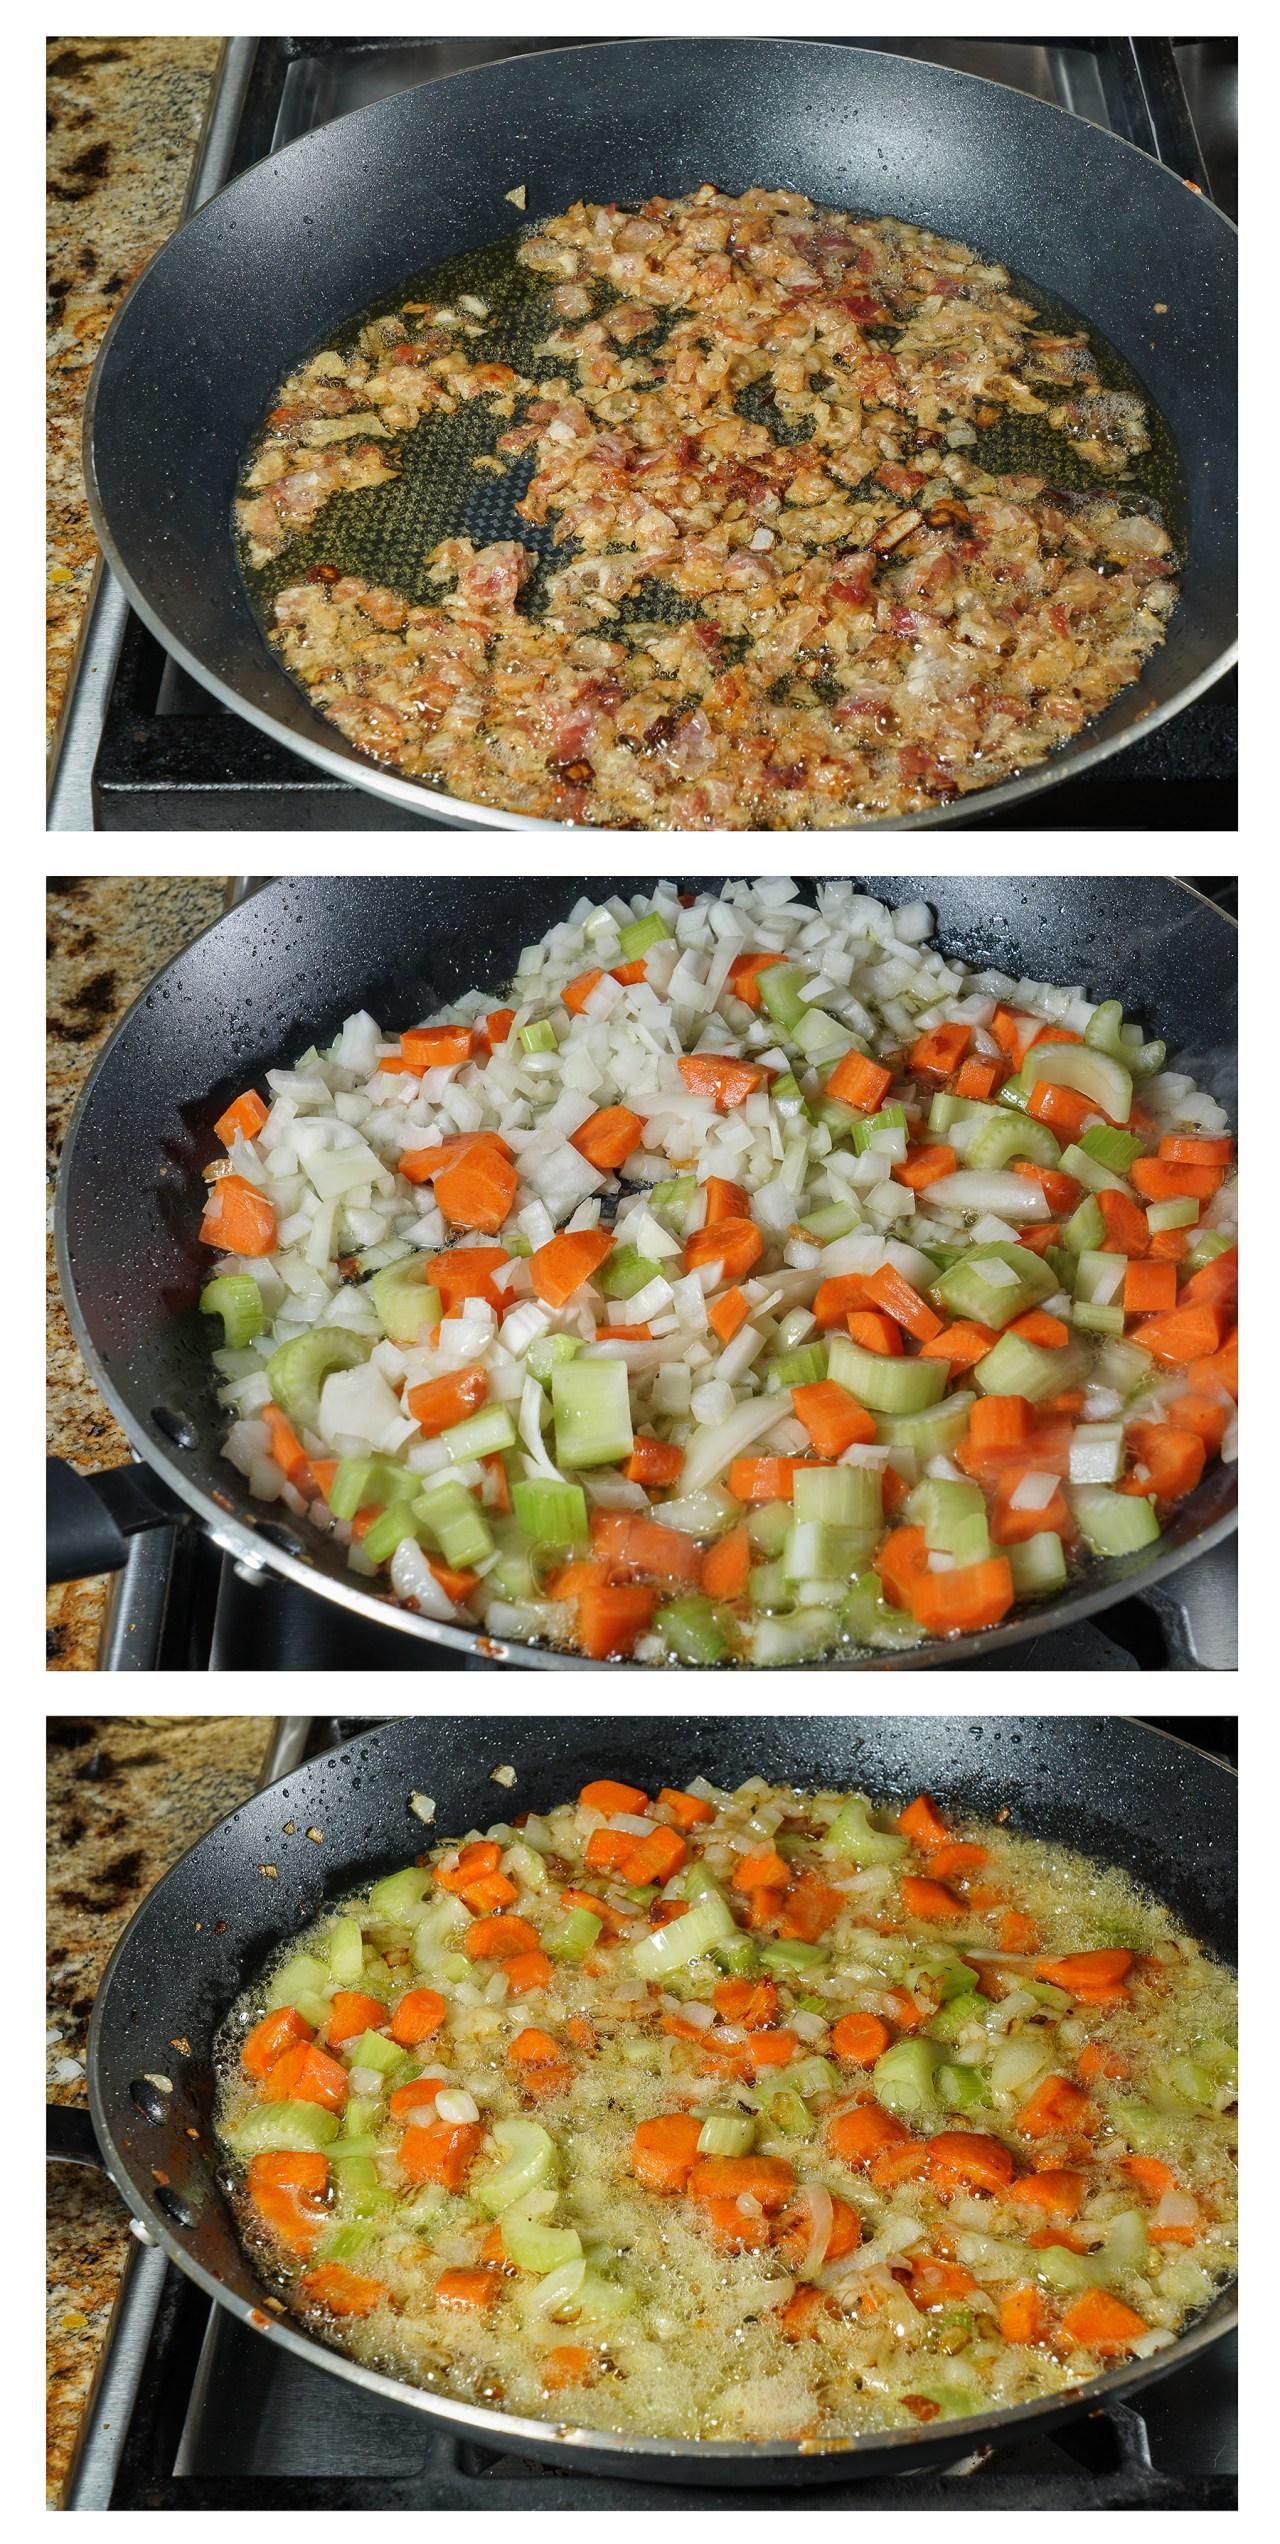 Sautéing pancetta and vegetables for Tuscan Bean Stew